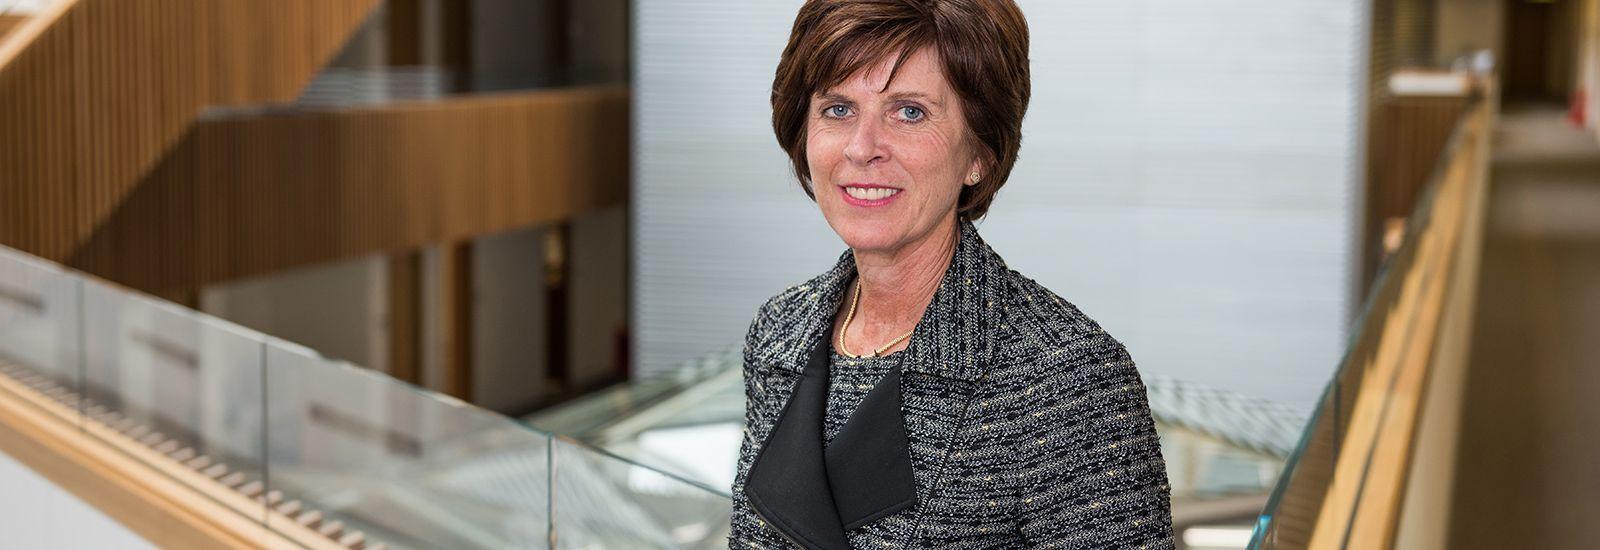 Professor Louise Richardson